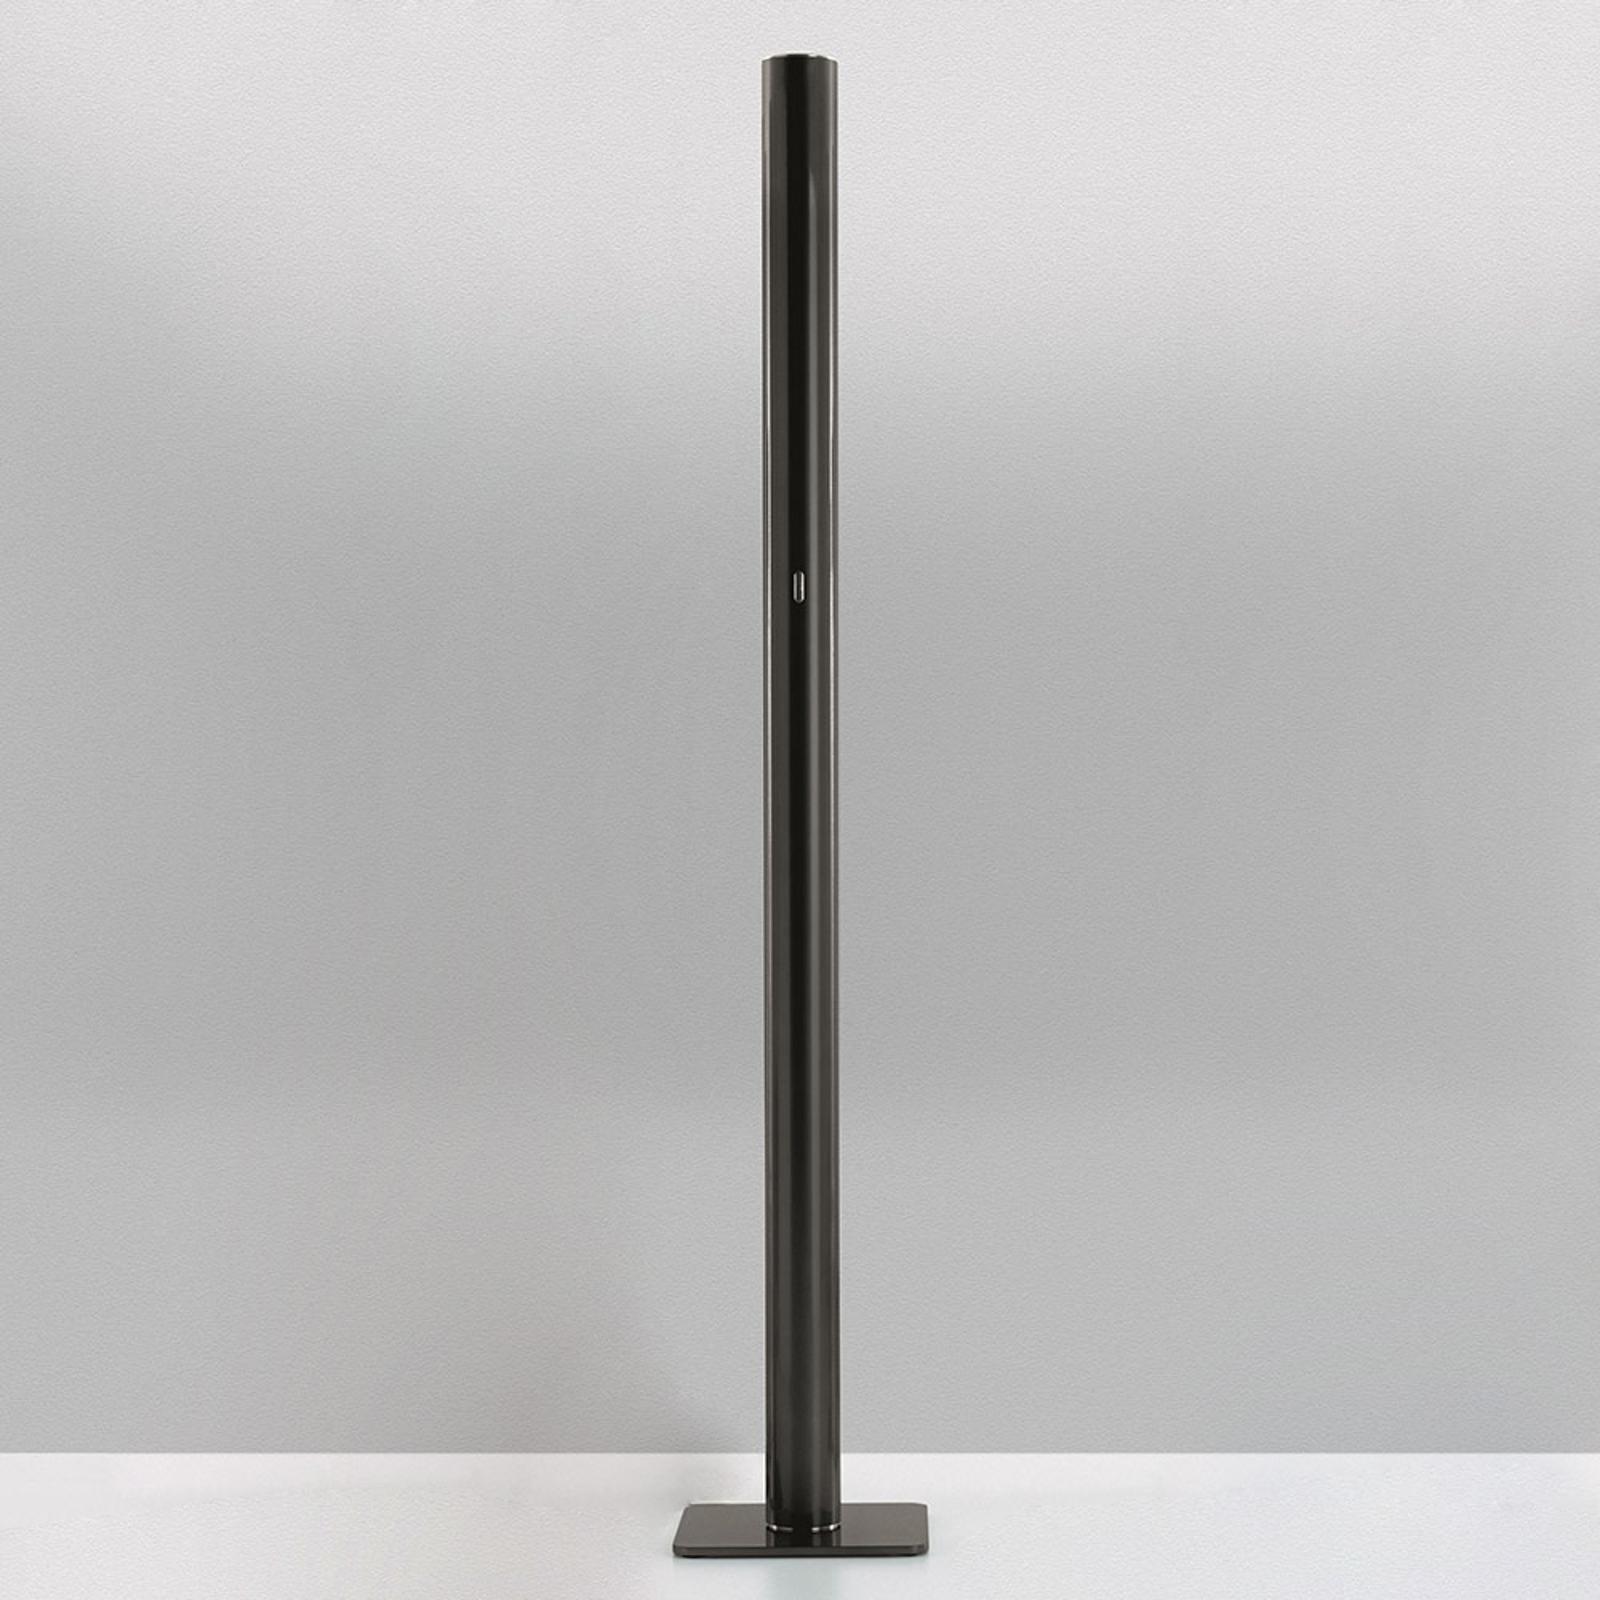 Artemide Ilio LED-lattiavalo sovell. musta 2700K